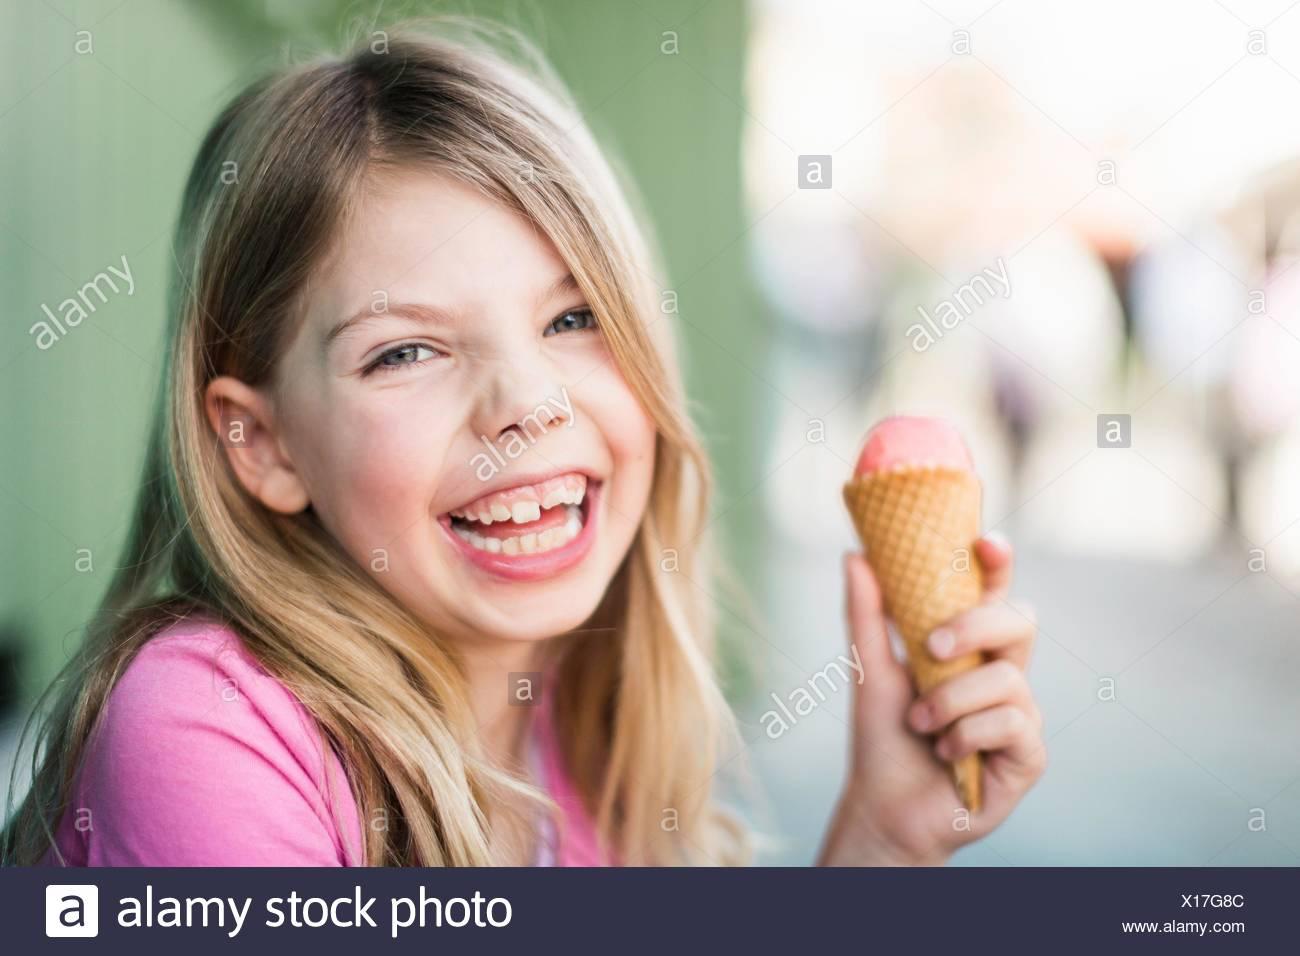 Portrait of young girl eating icecream - Stock Image